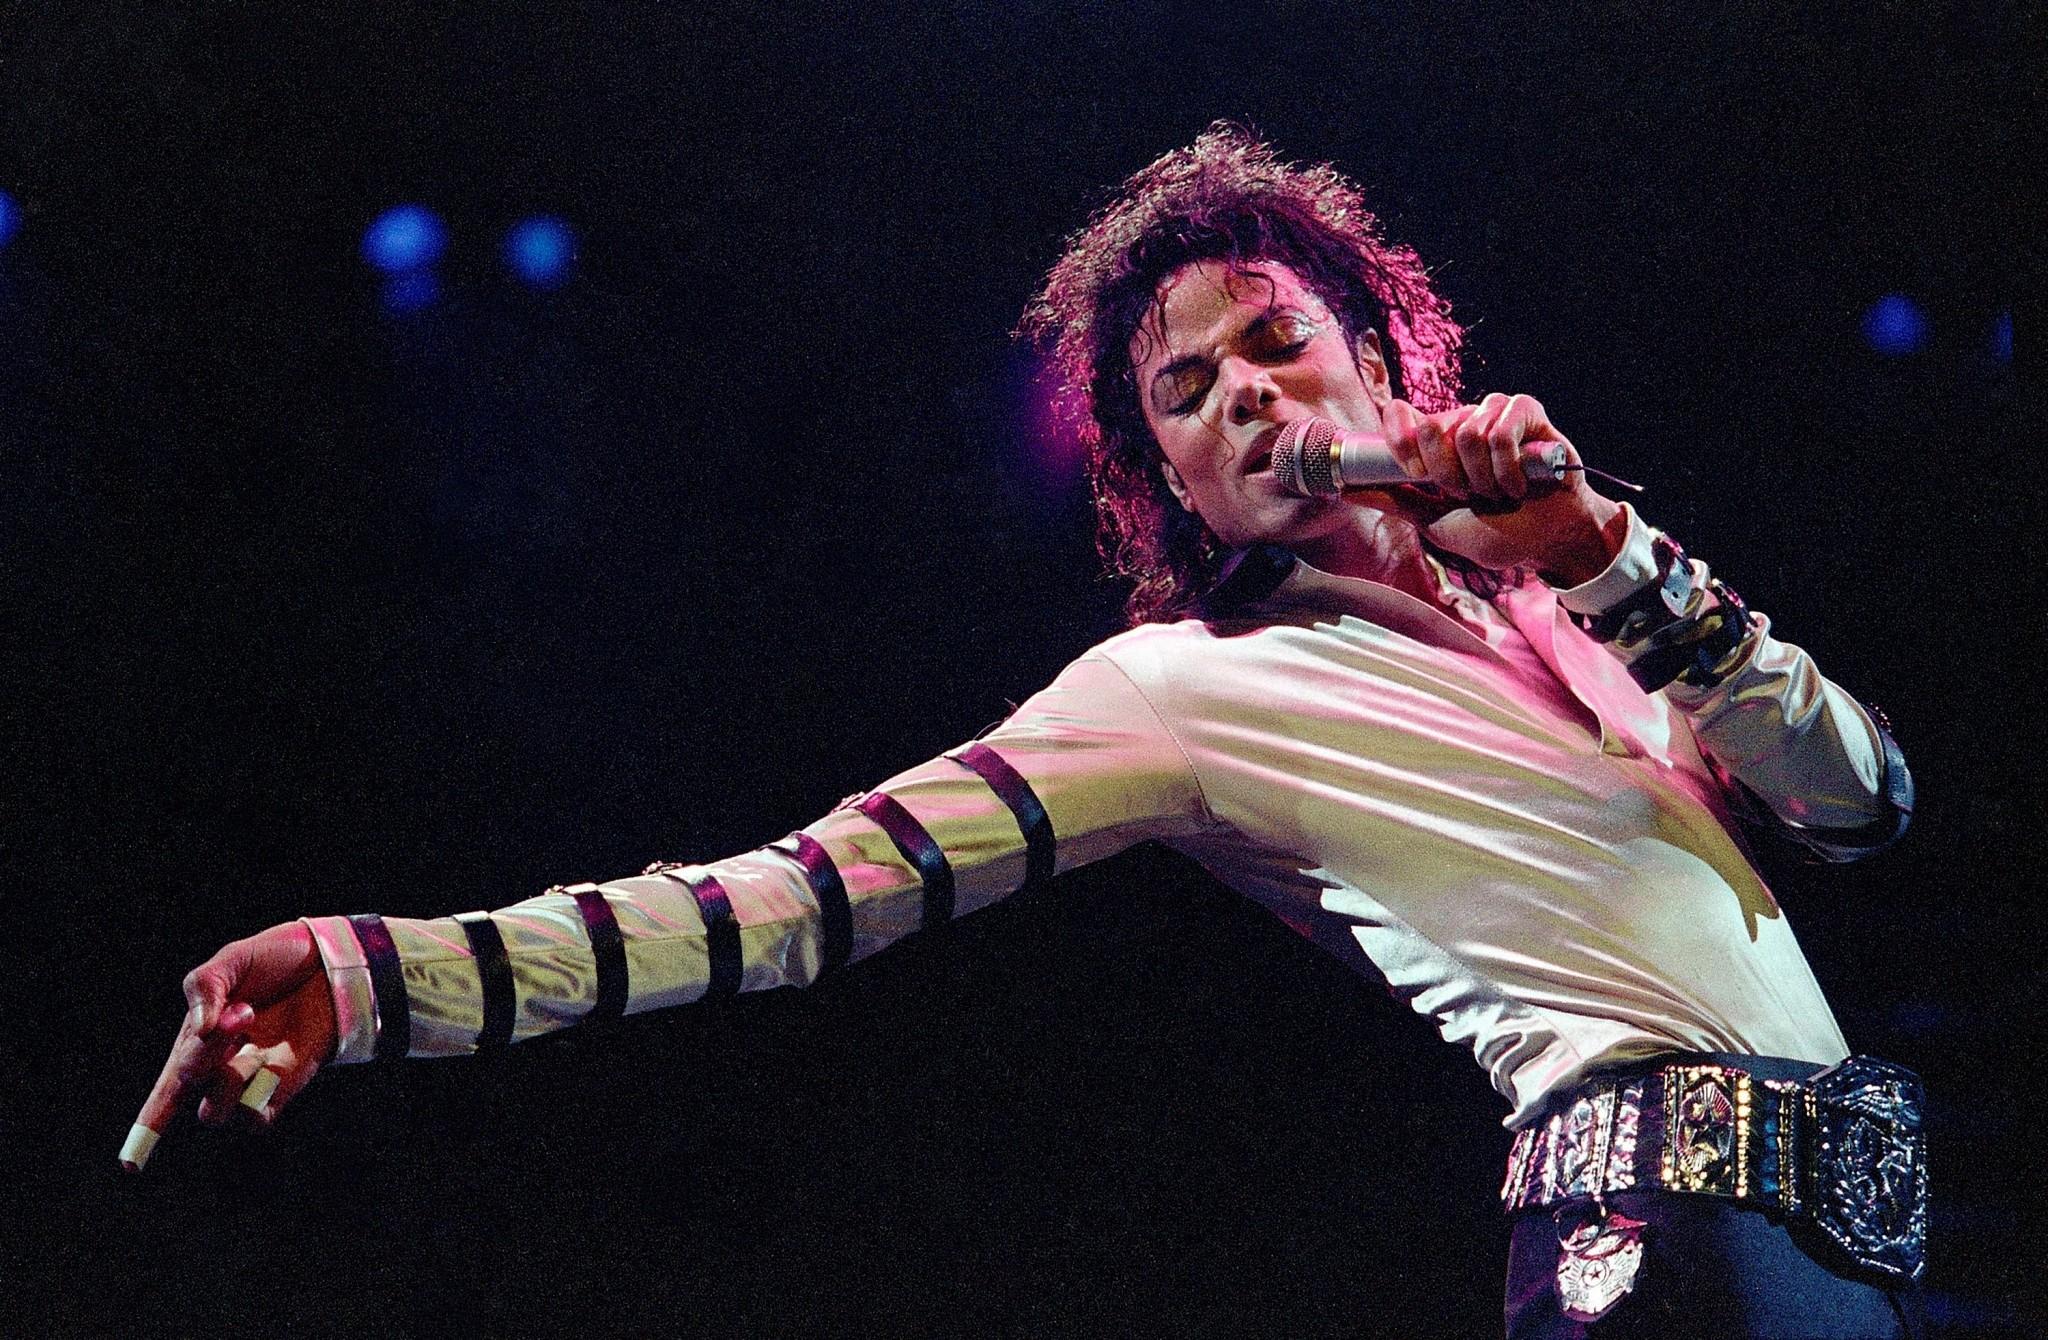 Michael Jackson Smooth Criminal Wallpaper 73 Pictures